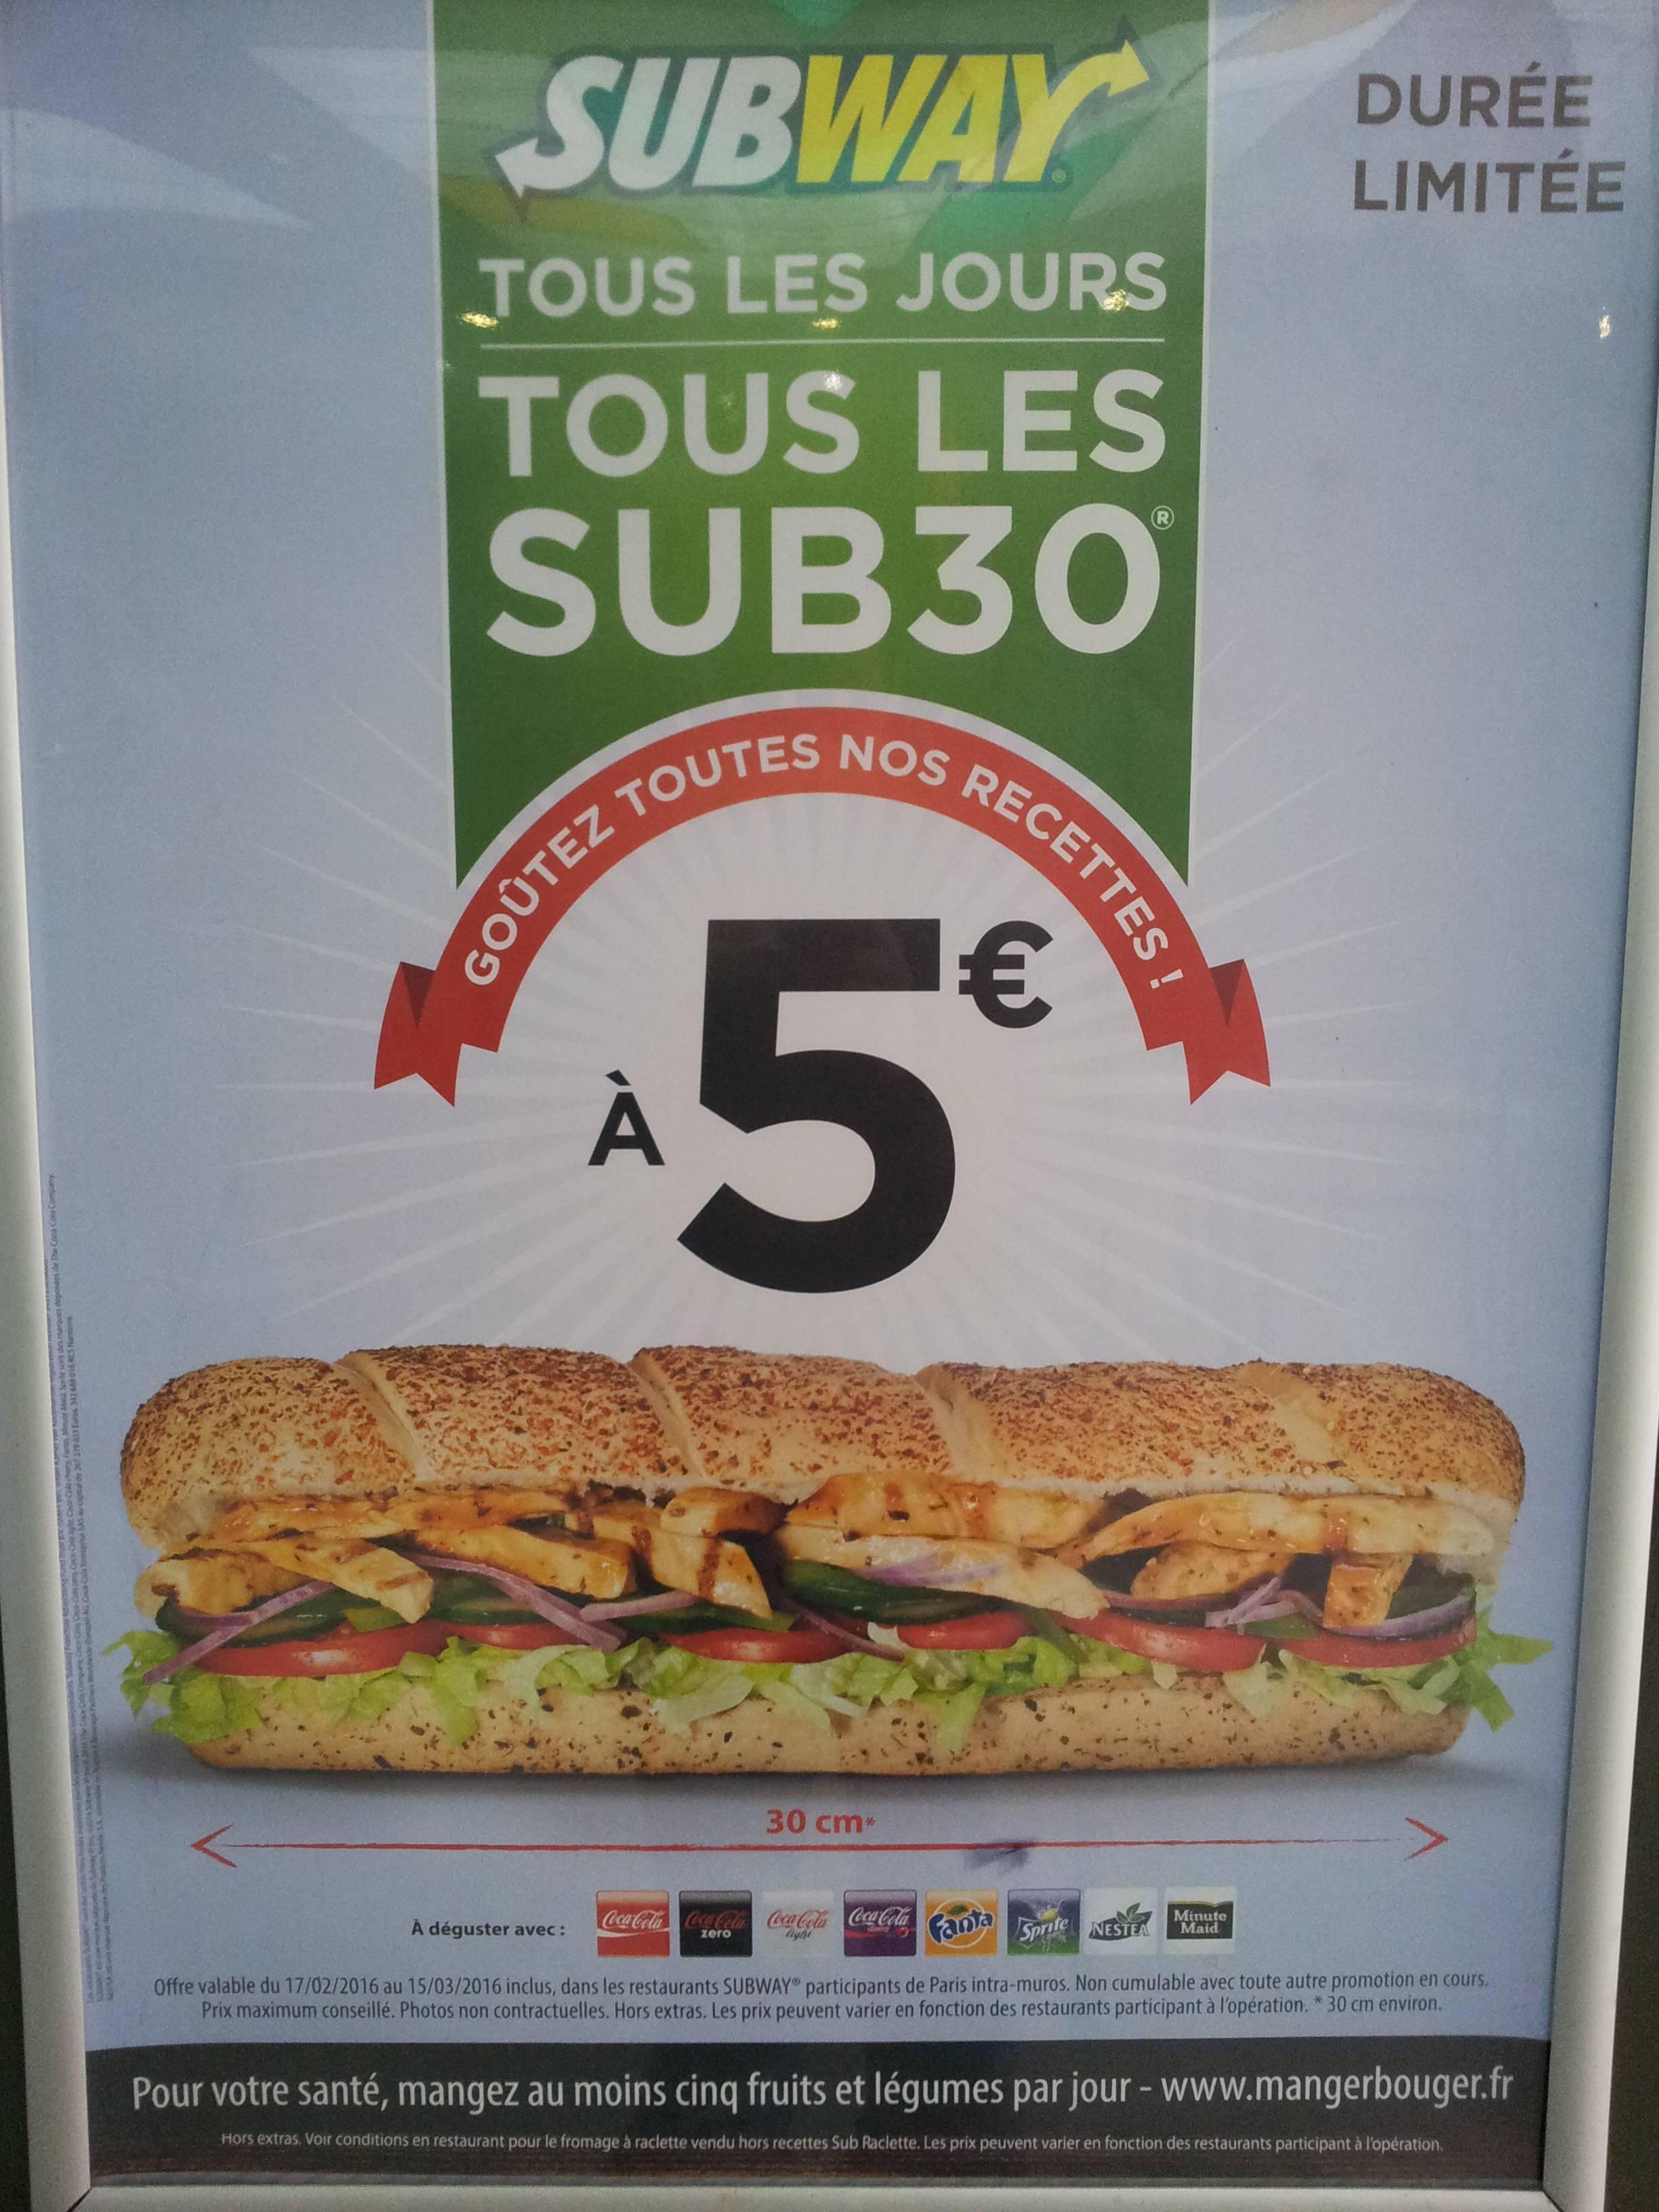 Sandwich Sub 30 au choix